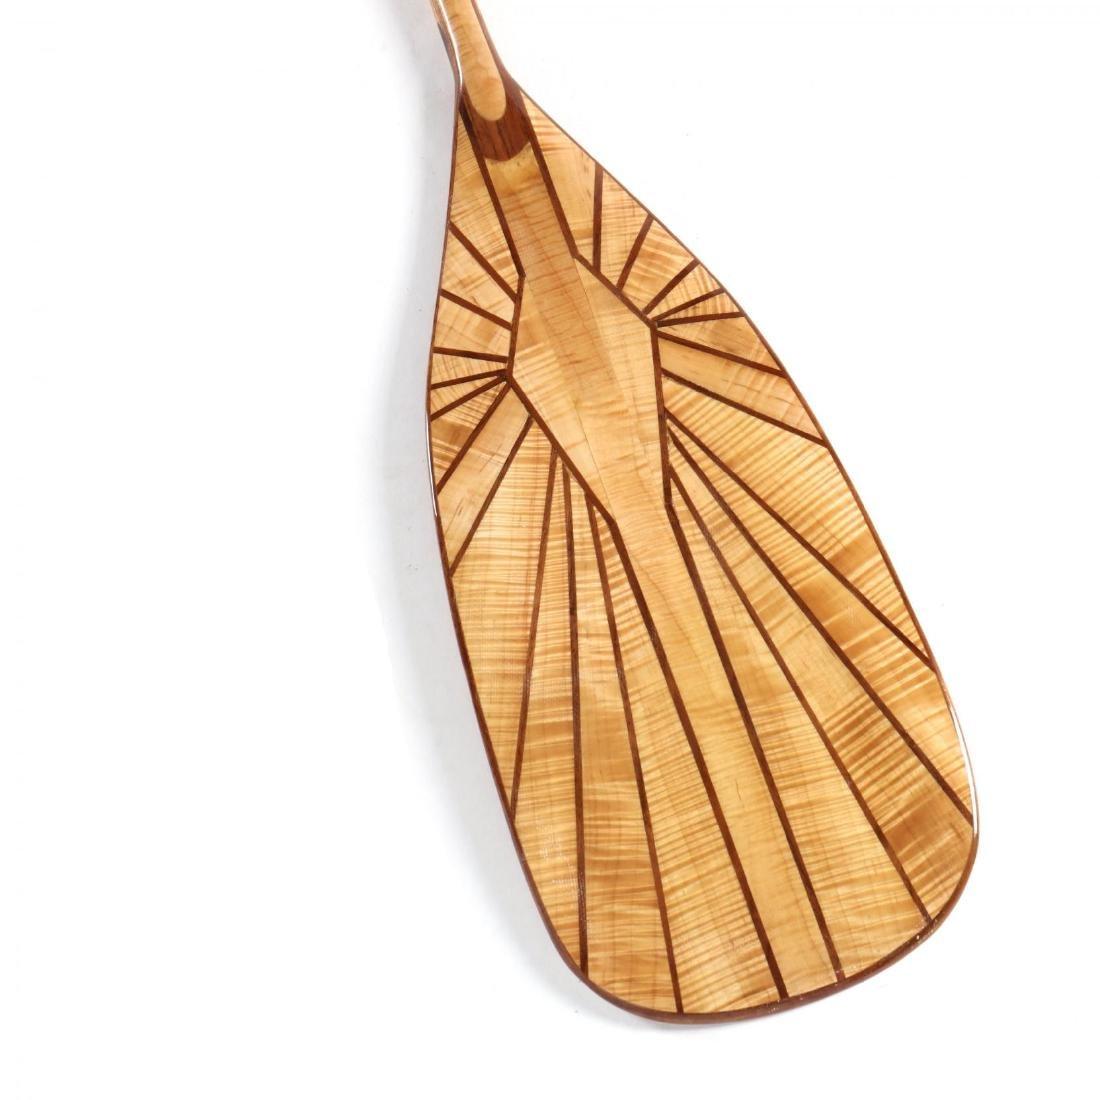 Two Artisan Inlaid Canoe Paddles - 2